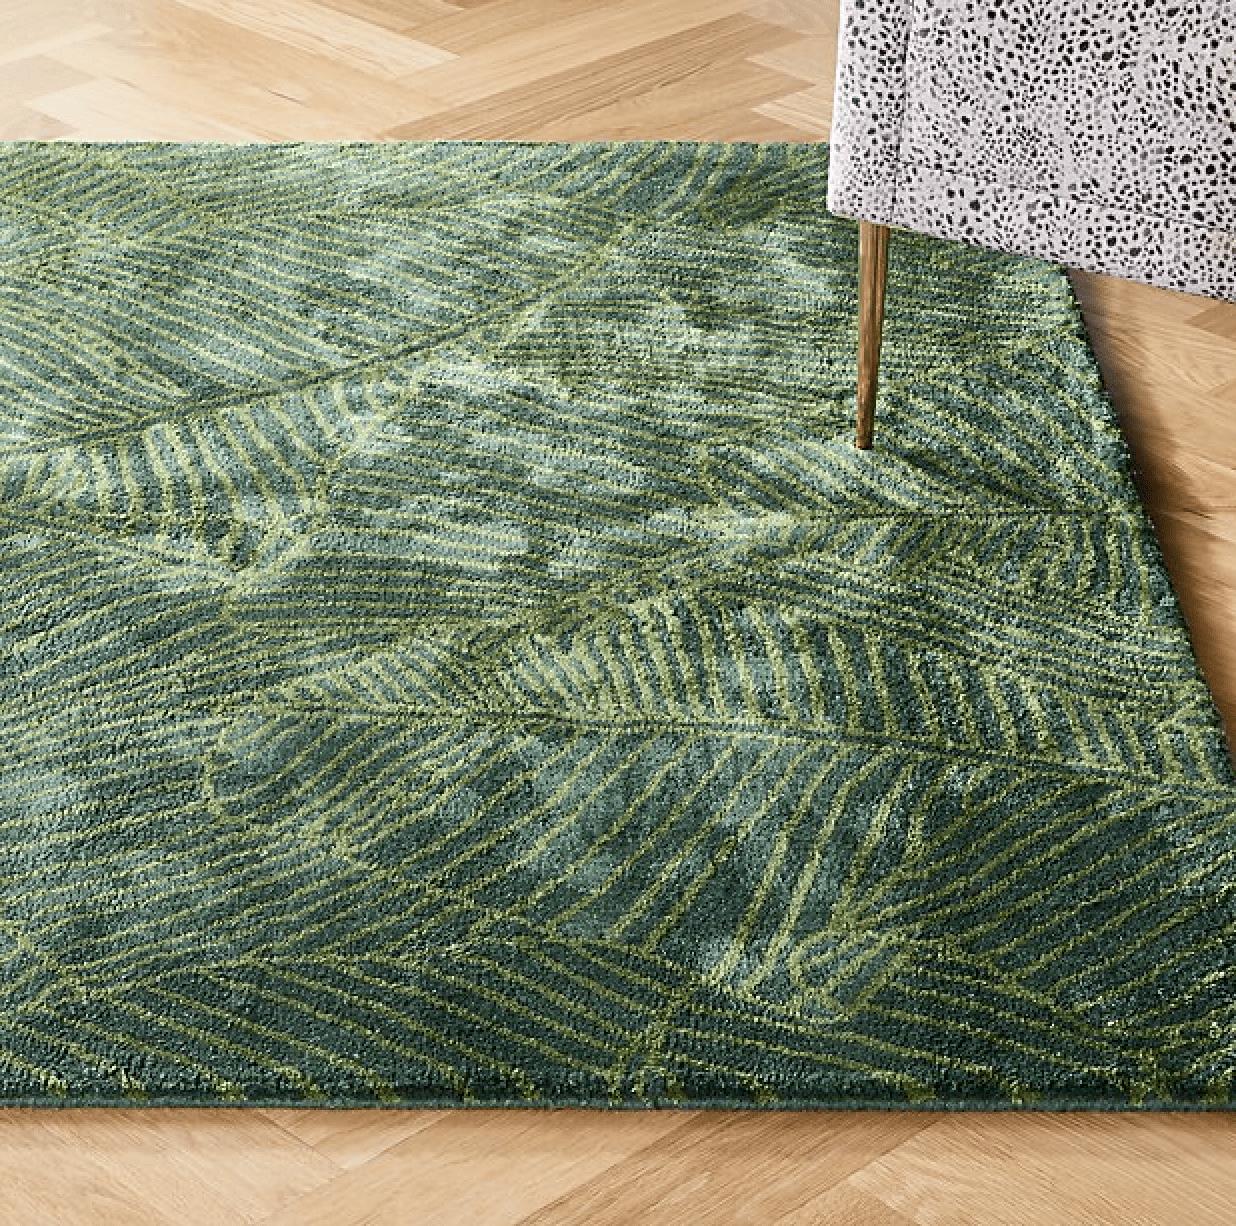 cb2 palm frond rug brooke